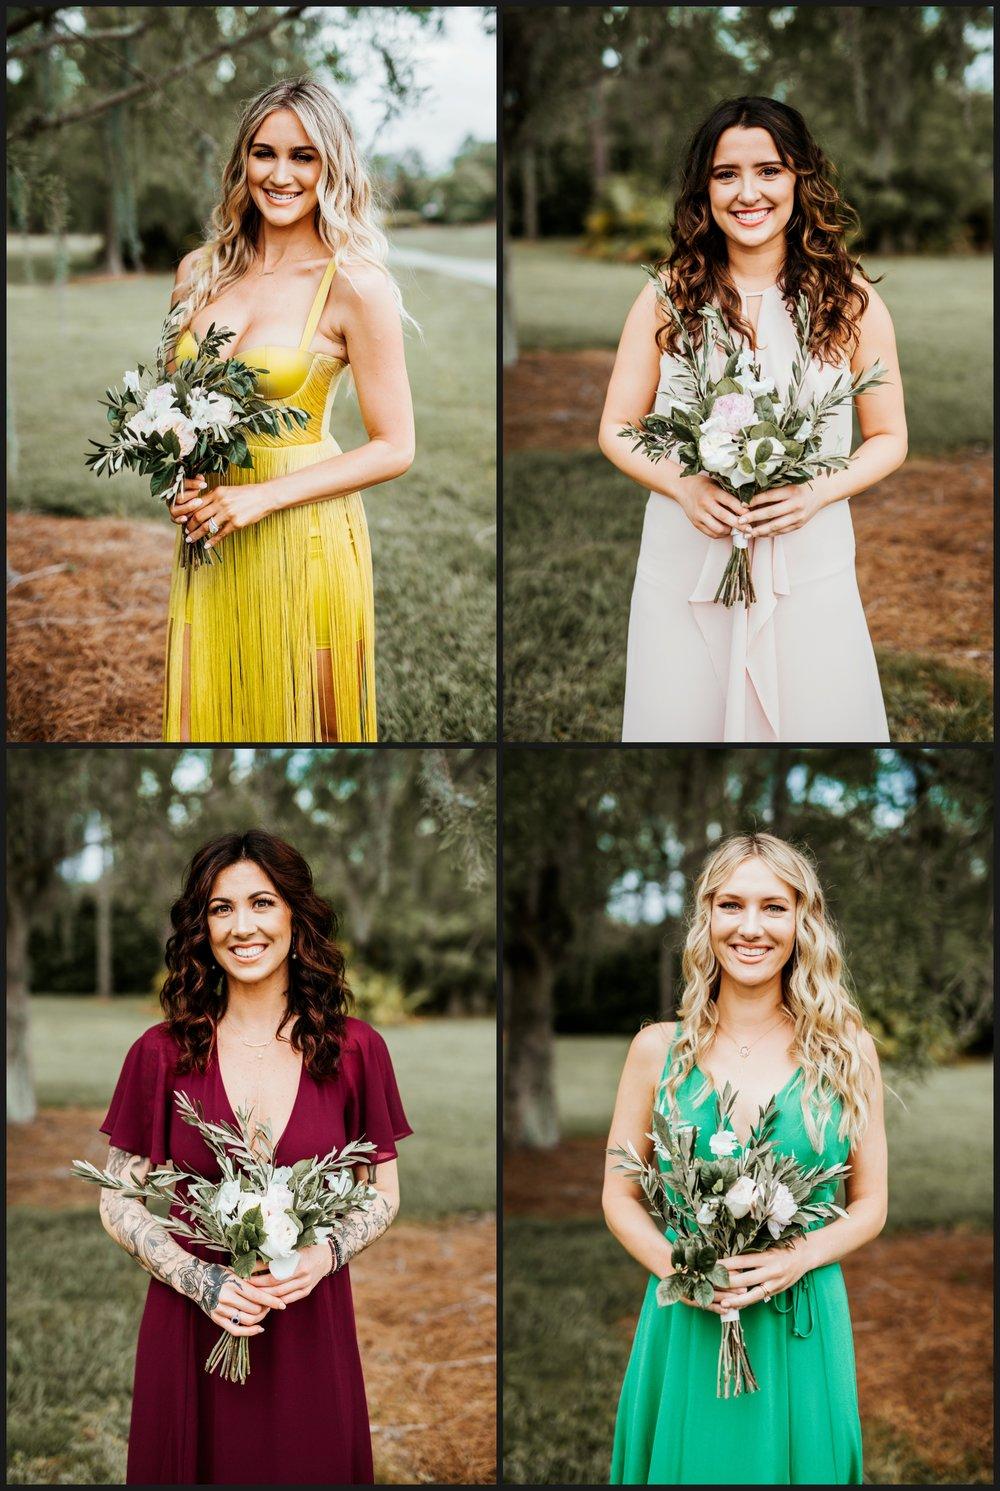 Orlando-Wedding-Photographer-destination-wedding-photographer-florida-wedding-photographer-hawaii-wedding-photographer_0179.jpg